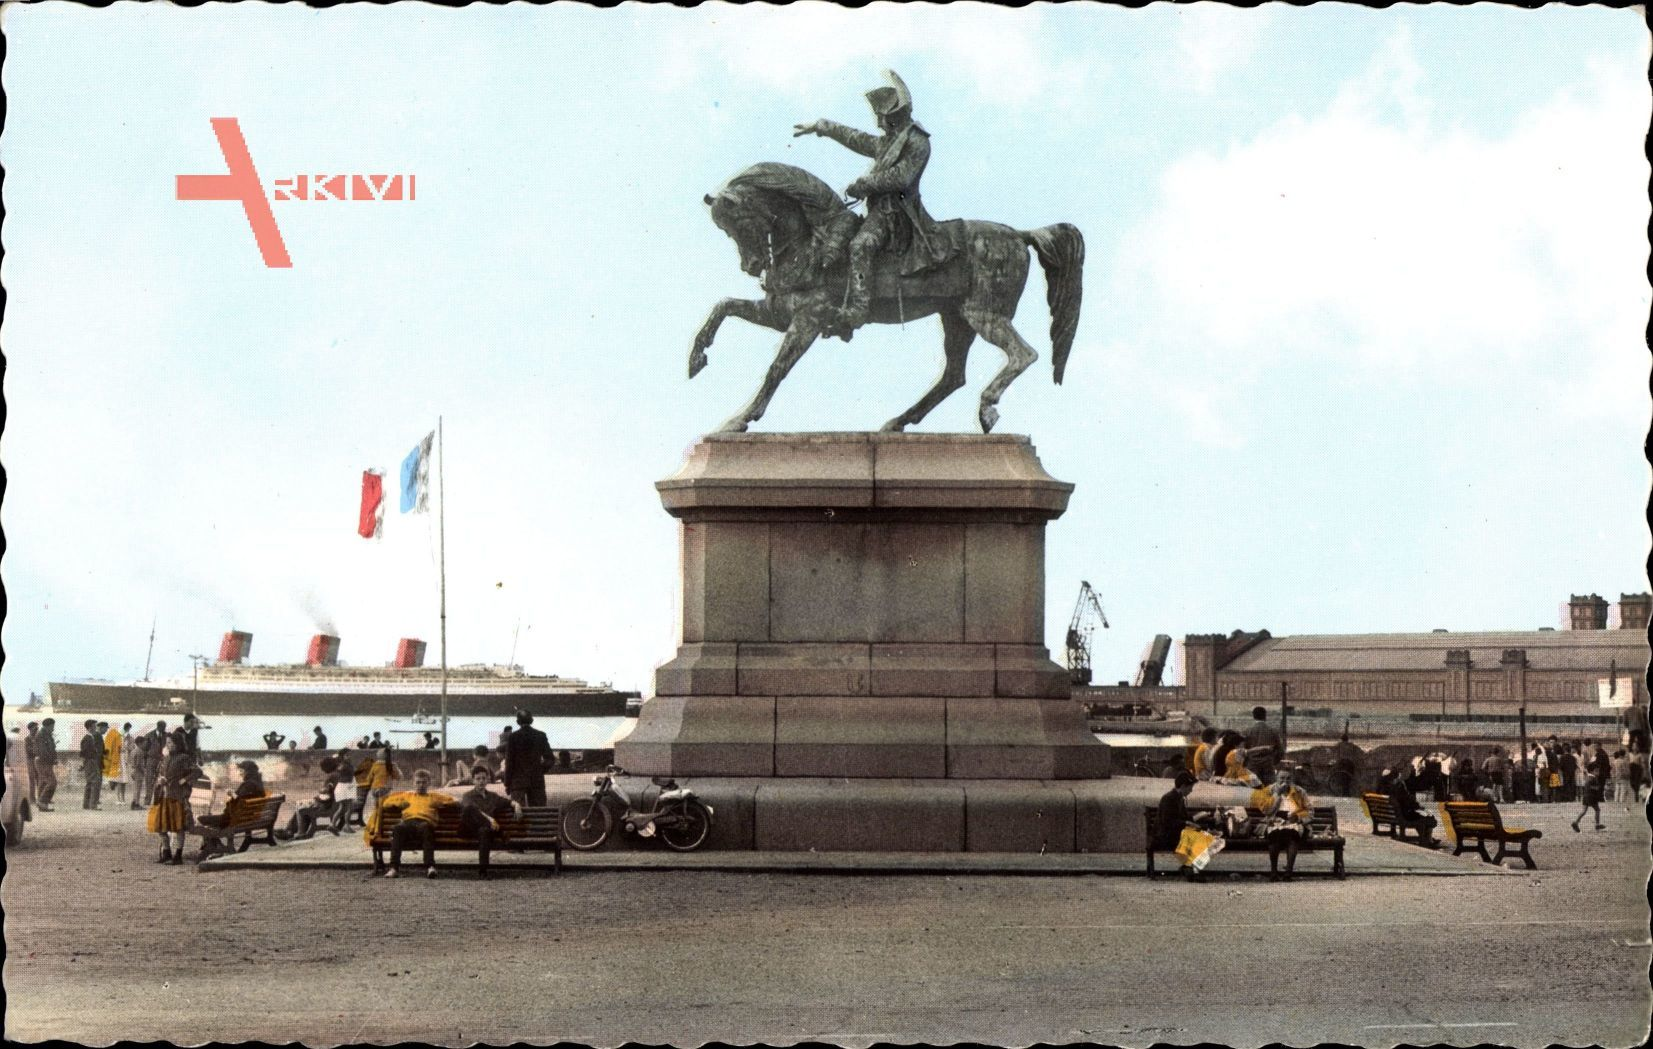 Cherbourg Octeville Manche, Statue de Napoleon, Steamer Queen Mary